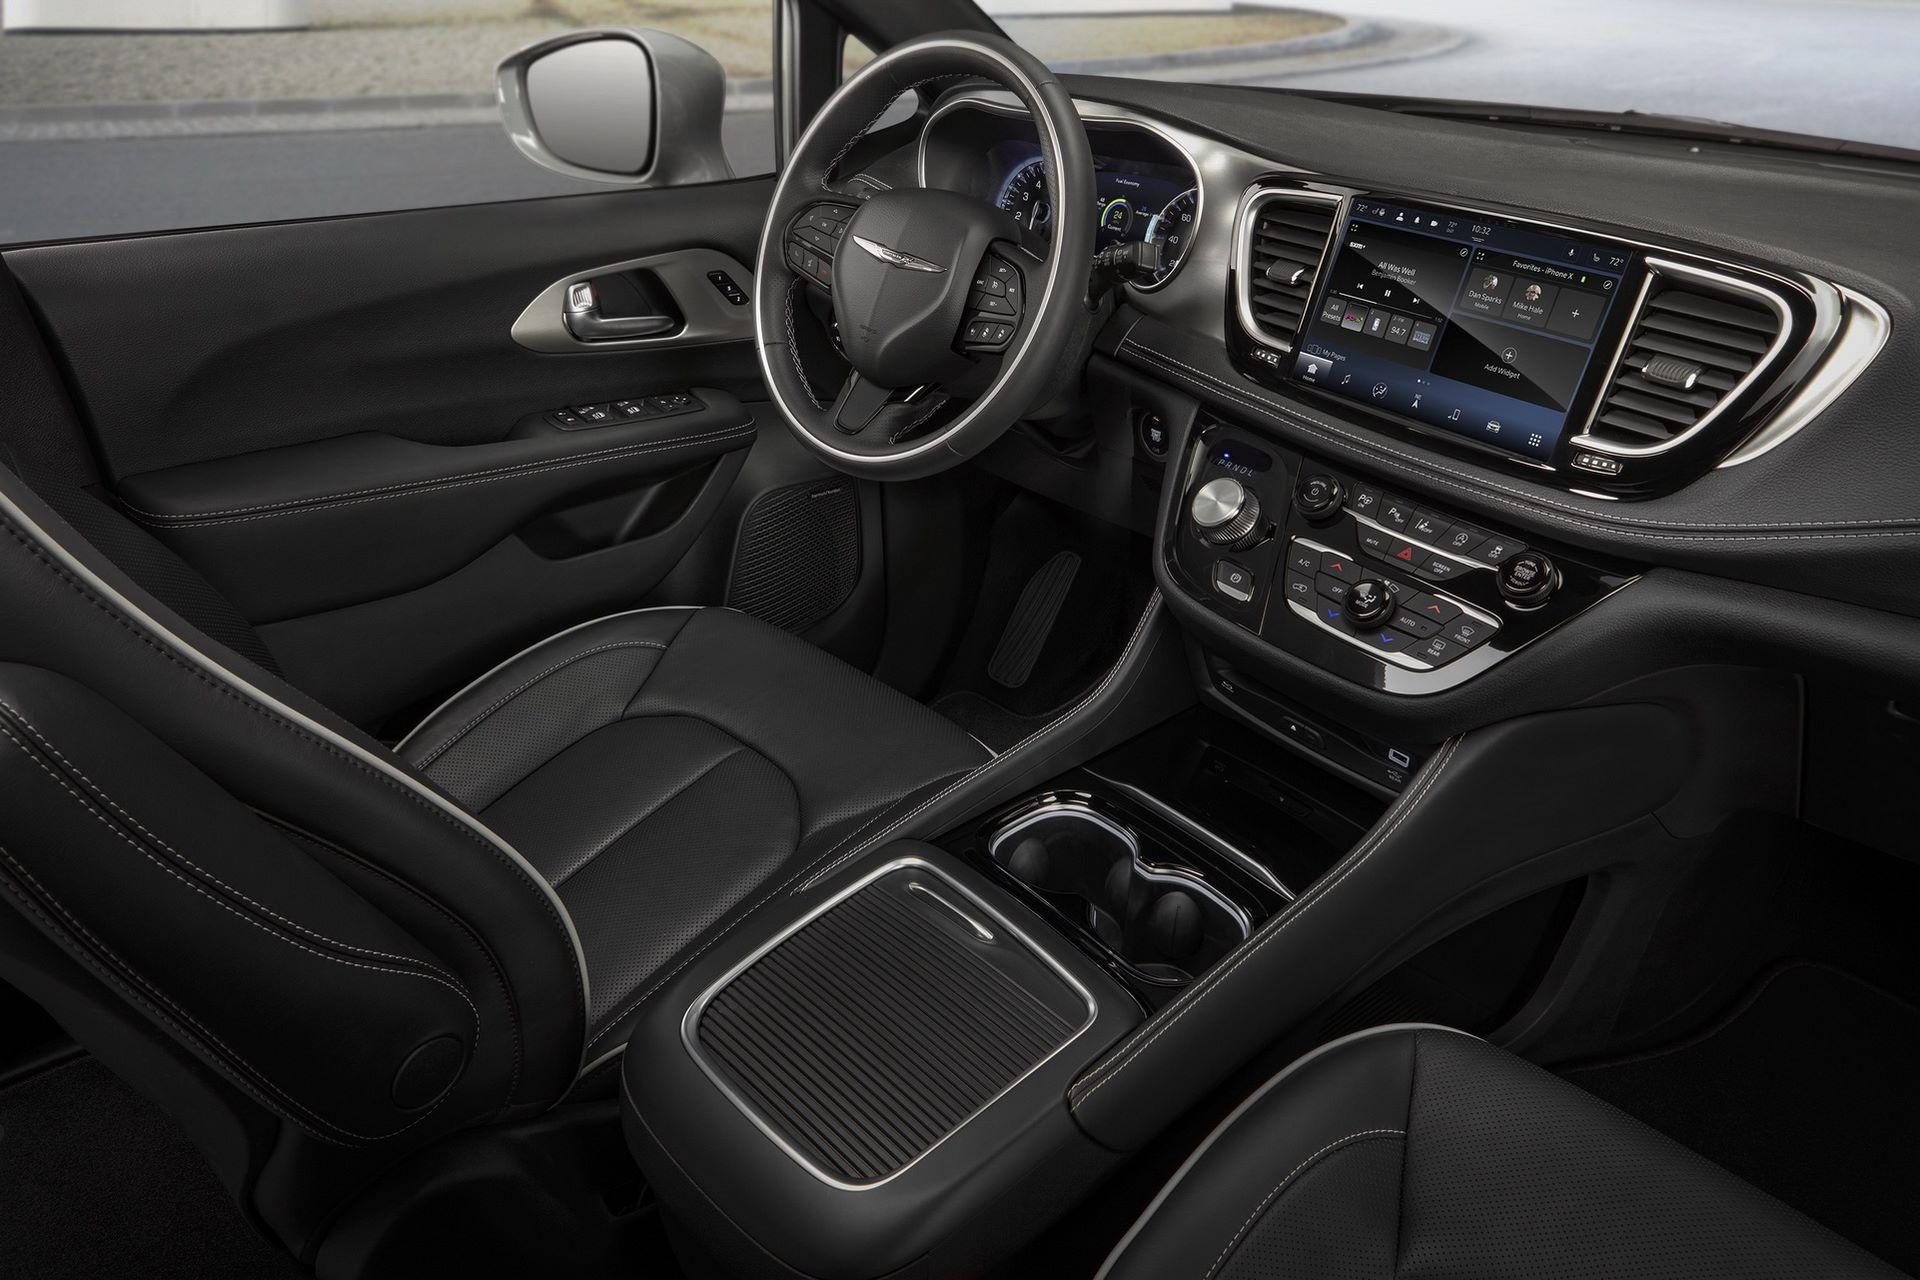 2021-Chrysler-Pacifica-146